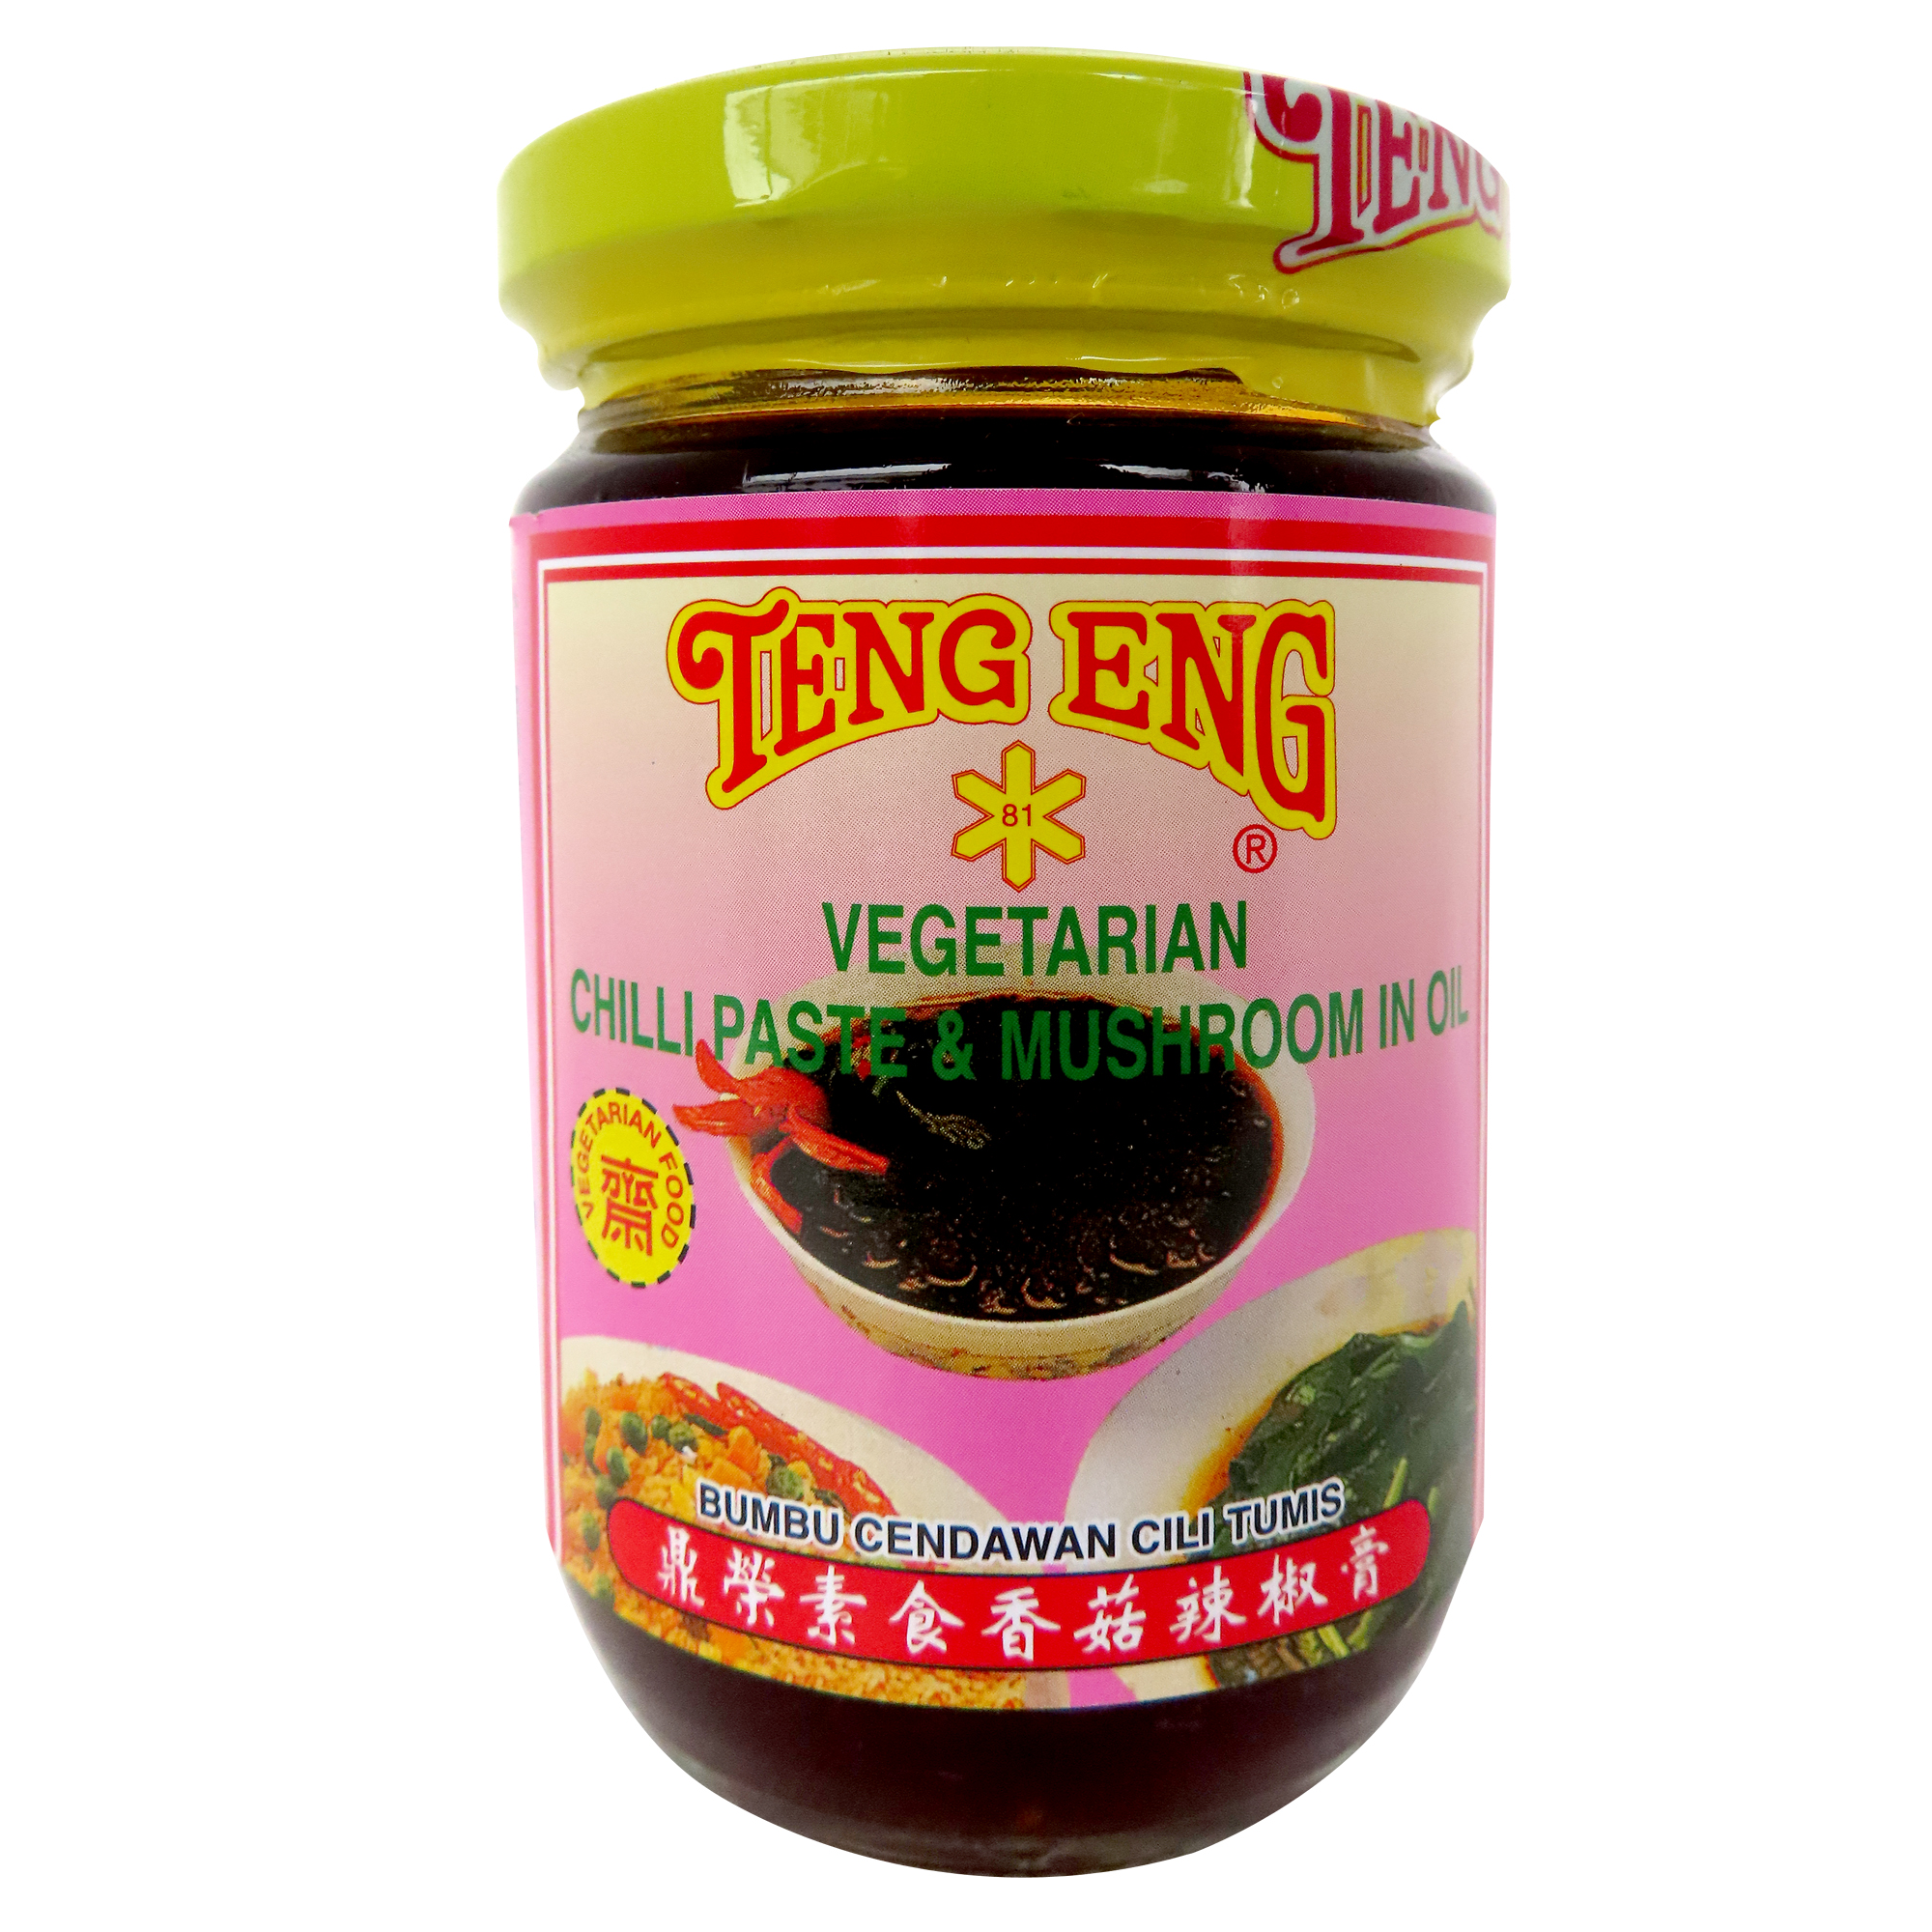 Image Vegetarian Chili Paste and mushroom 鼎荣-香菇辣椒膏 227 grams